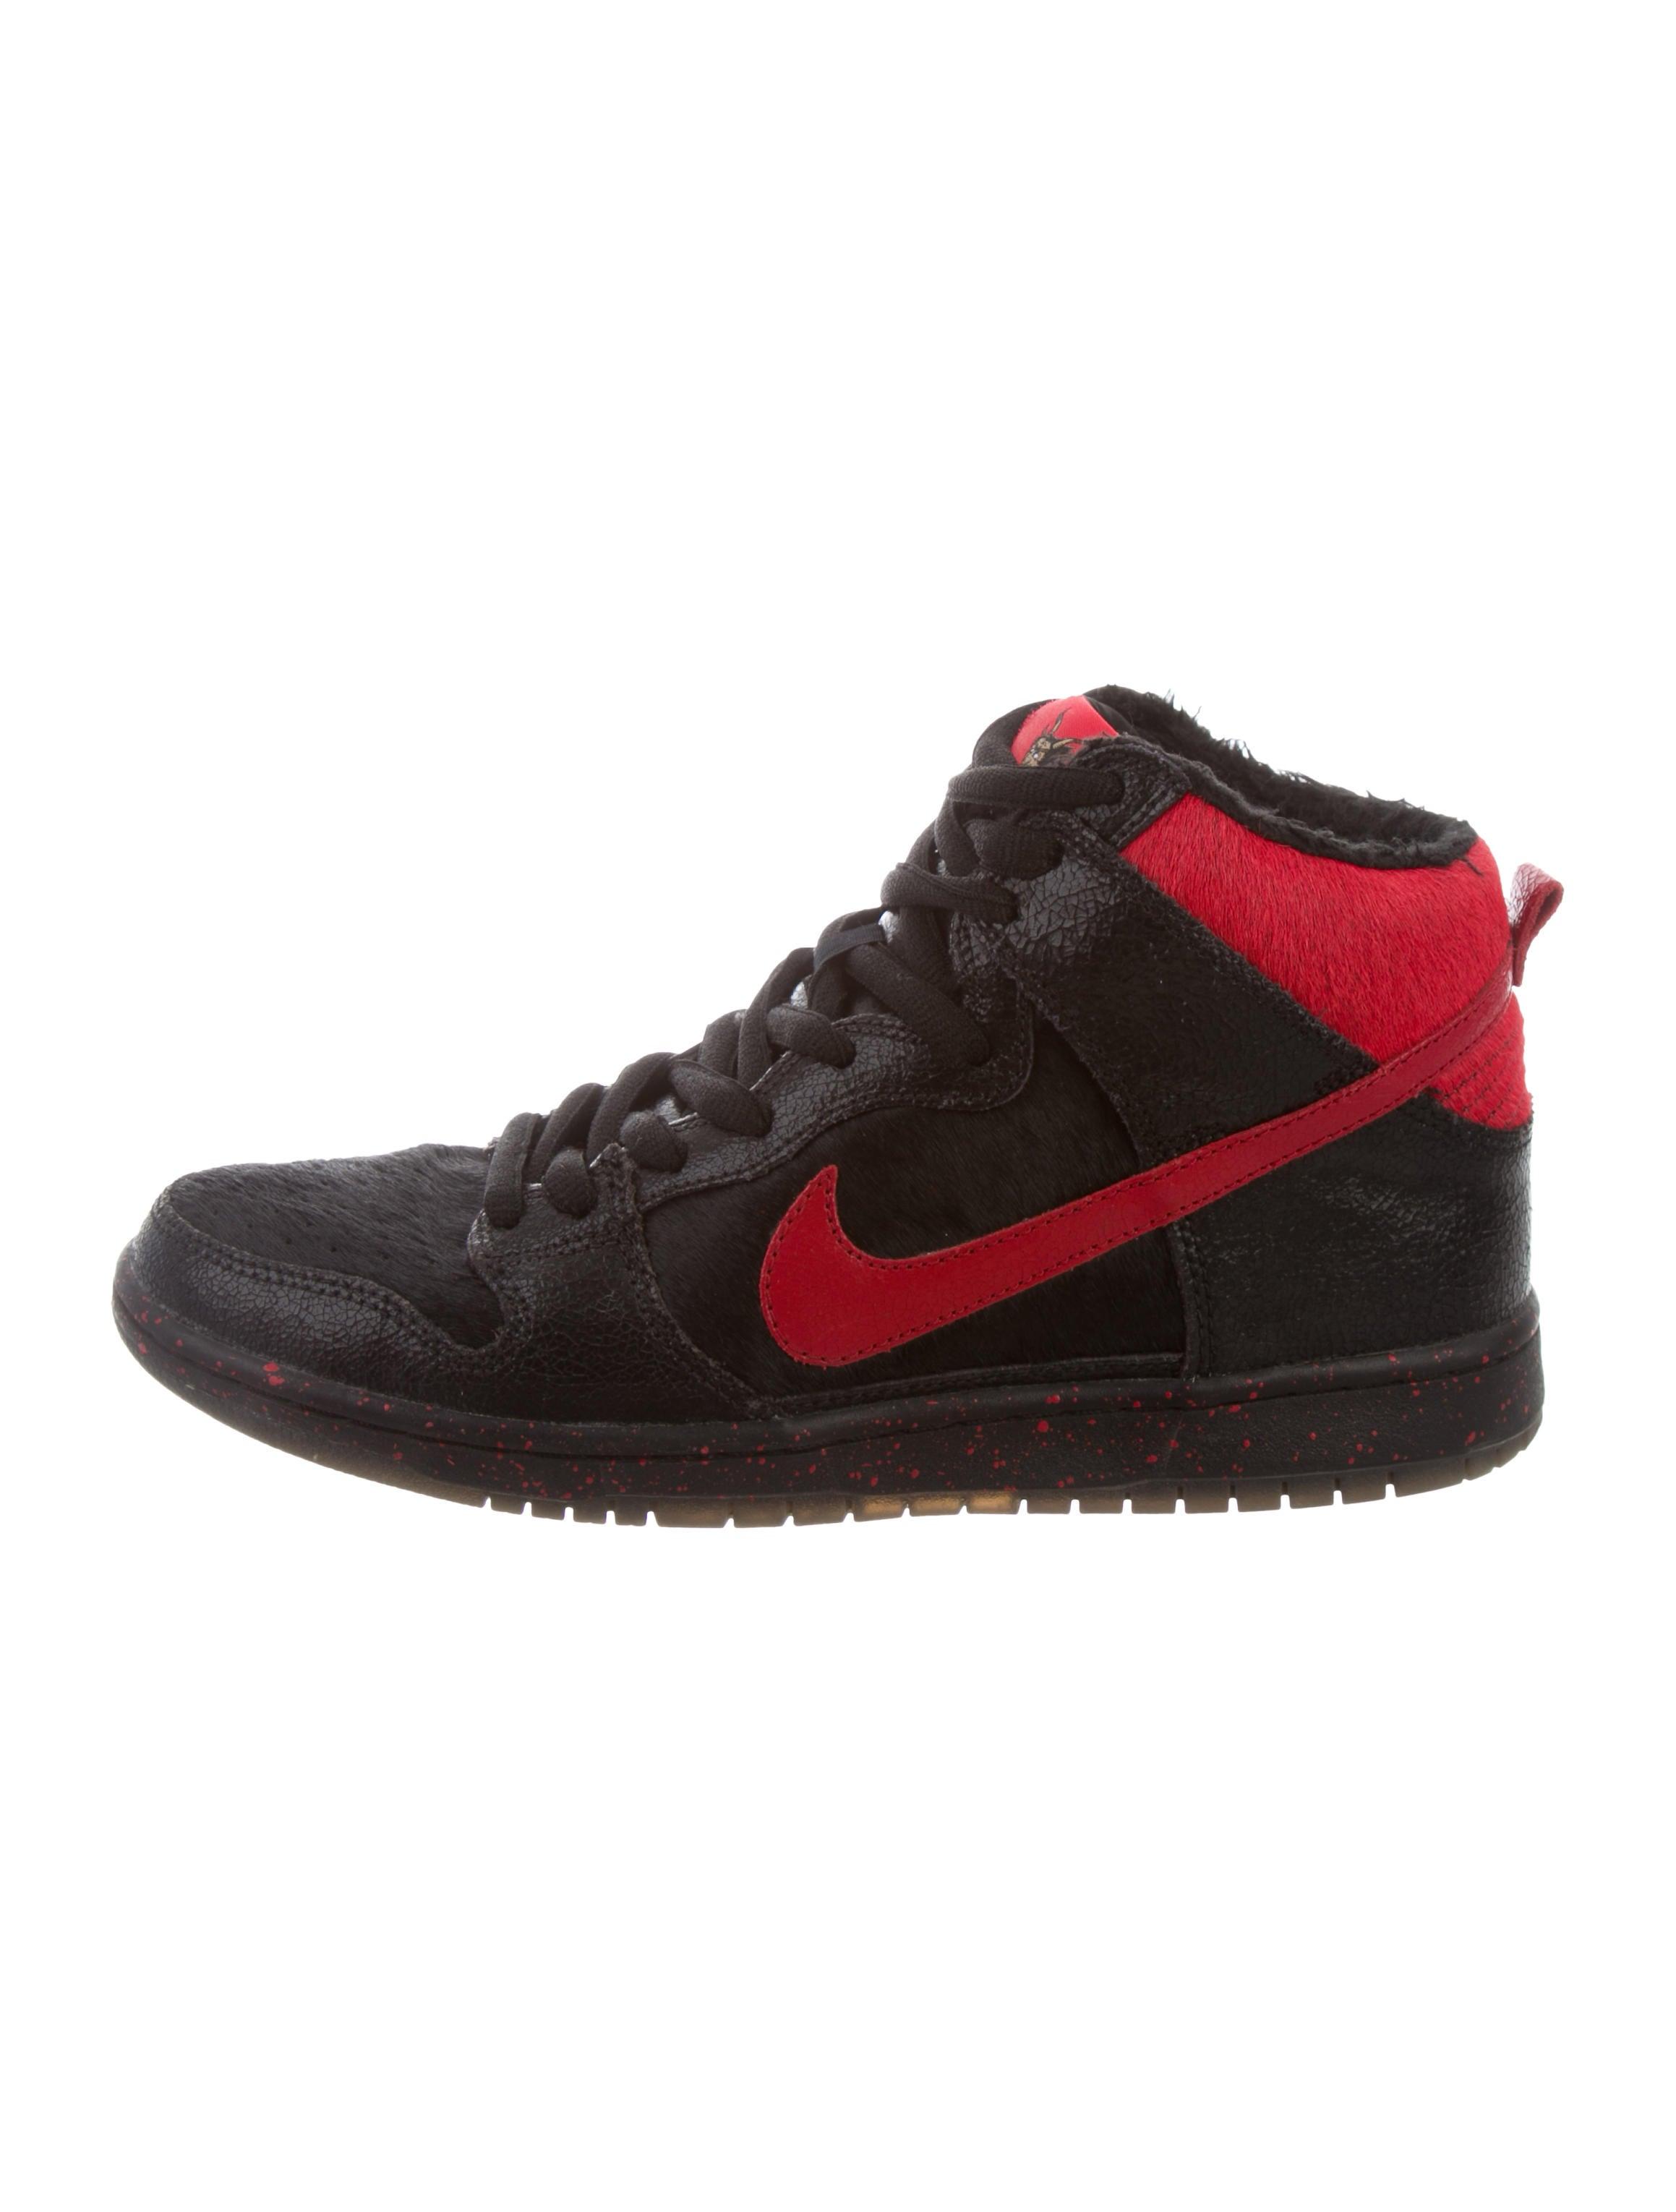 cheap for discount 3768b 1466e Nike Dunk High Pro Premium SB Krampus Sneakers - Shoes ...